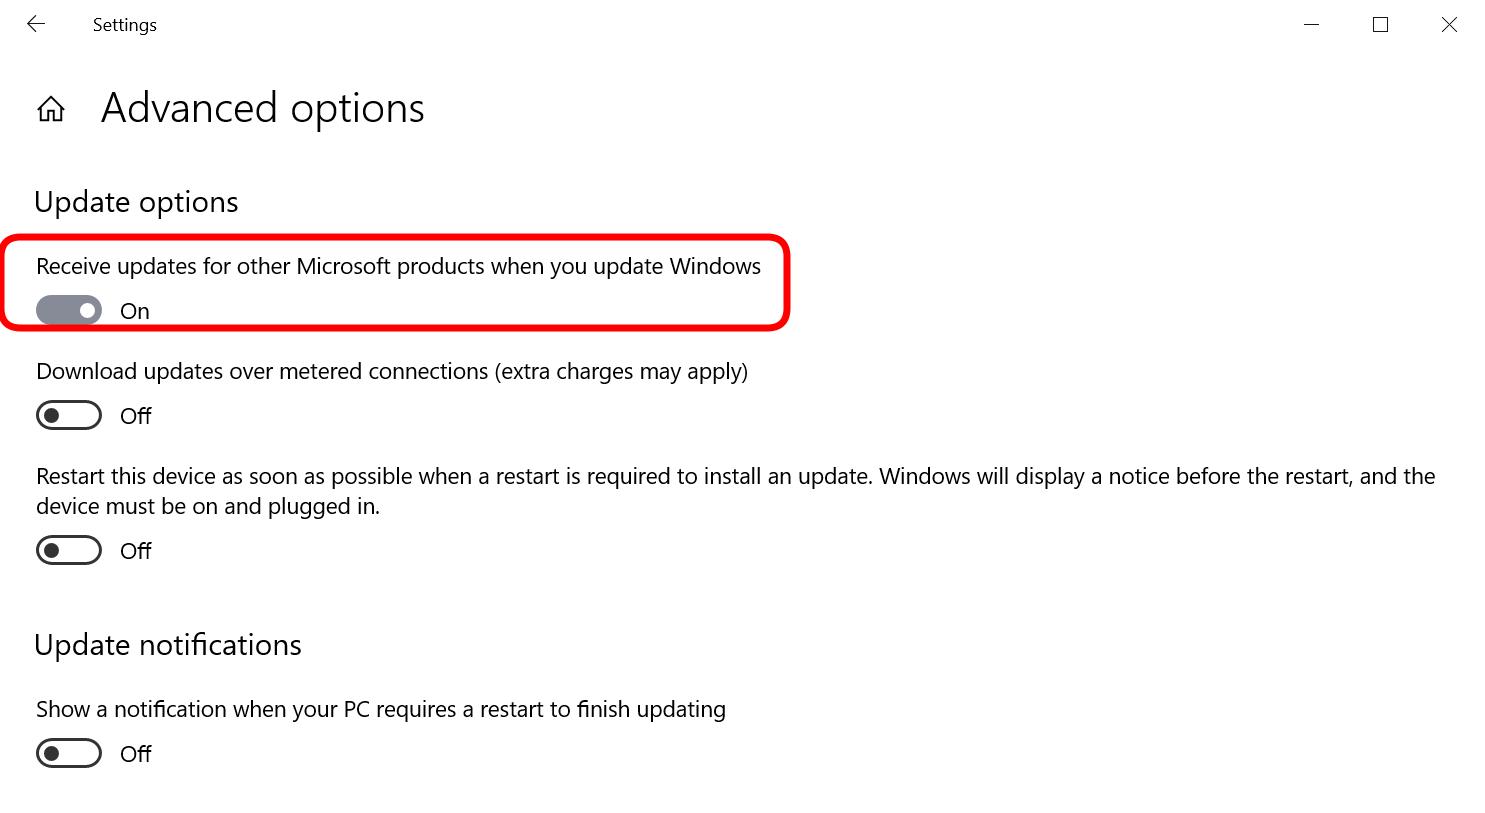 microsoft updates - .NET Core updates via Windows Update